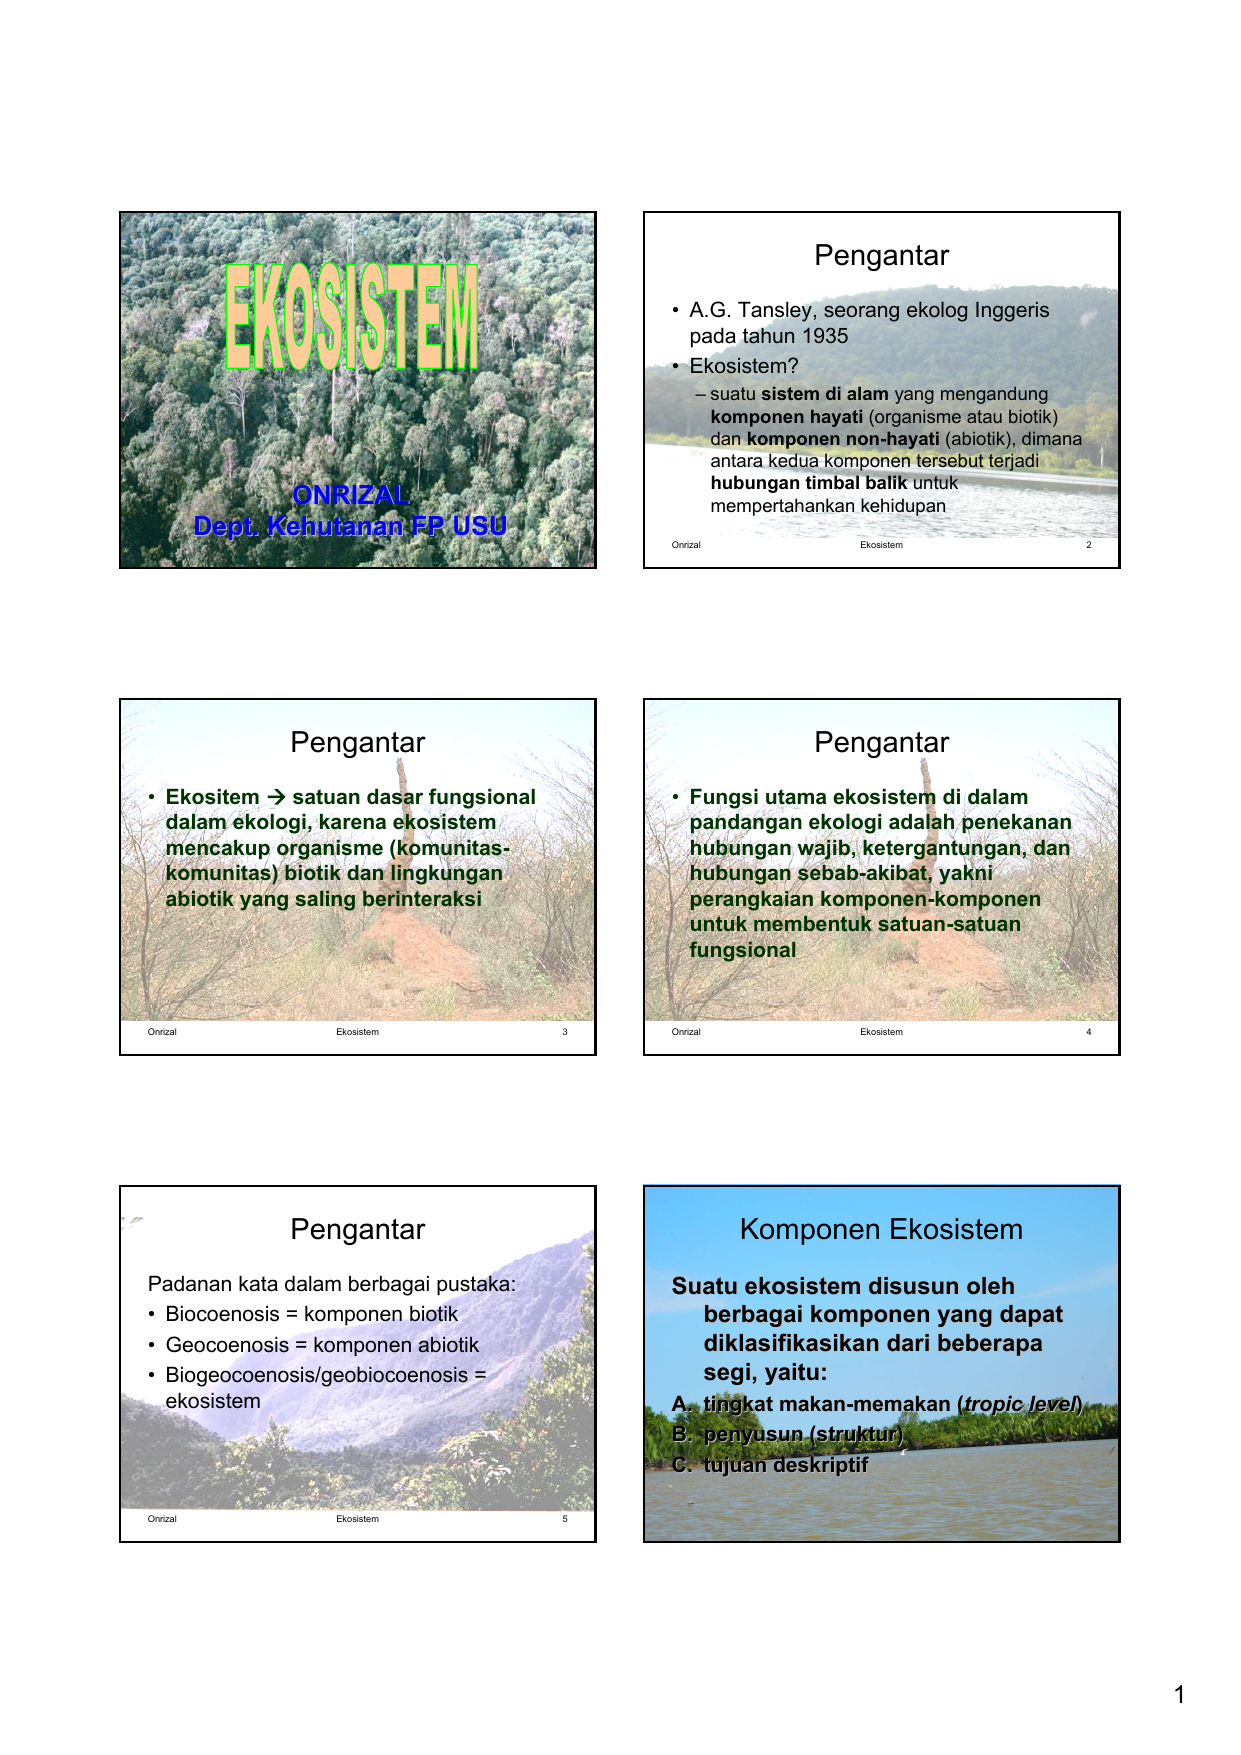 2 Ekologi Hutan Ekosistem